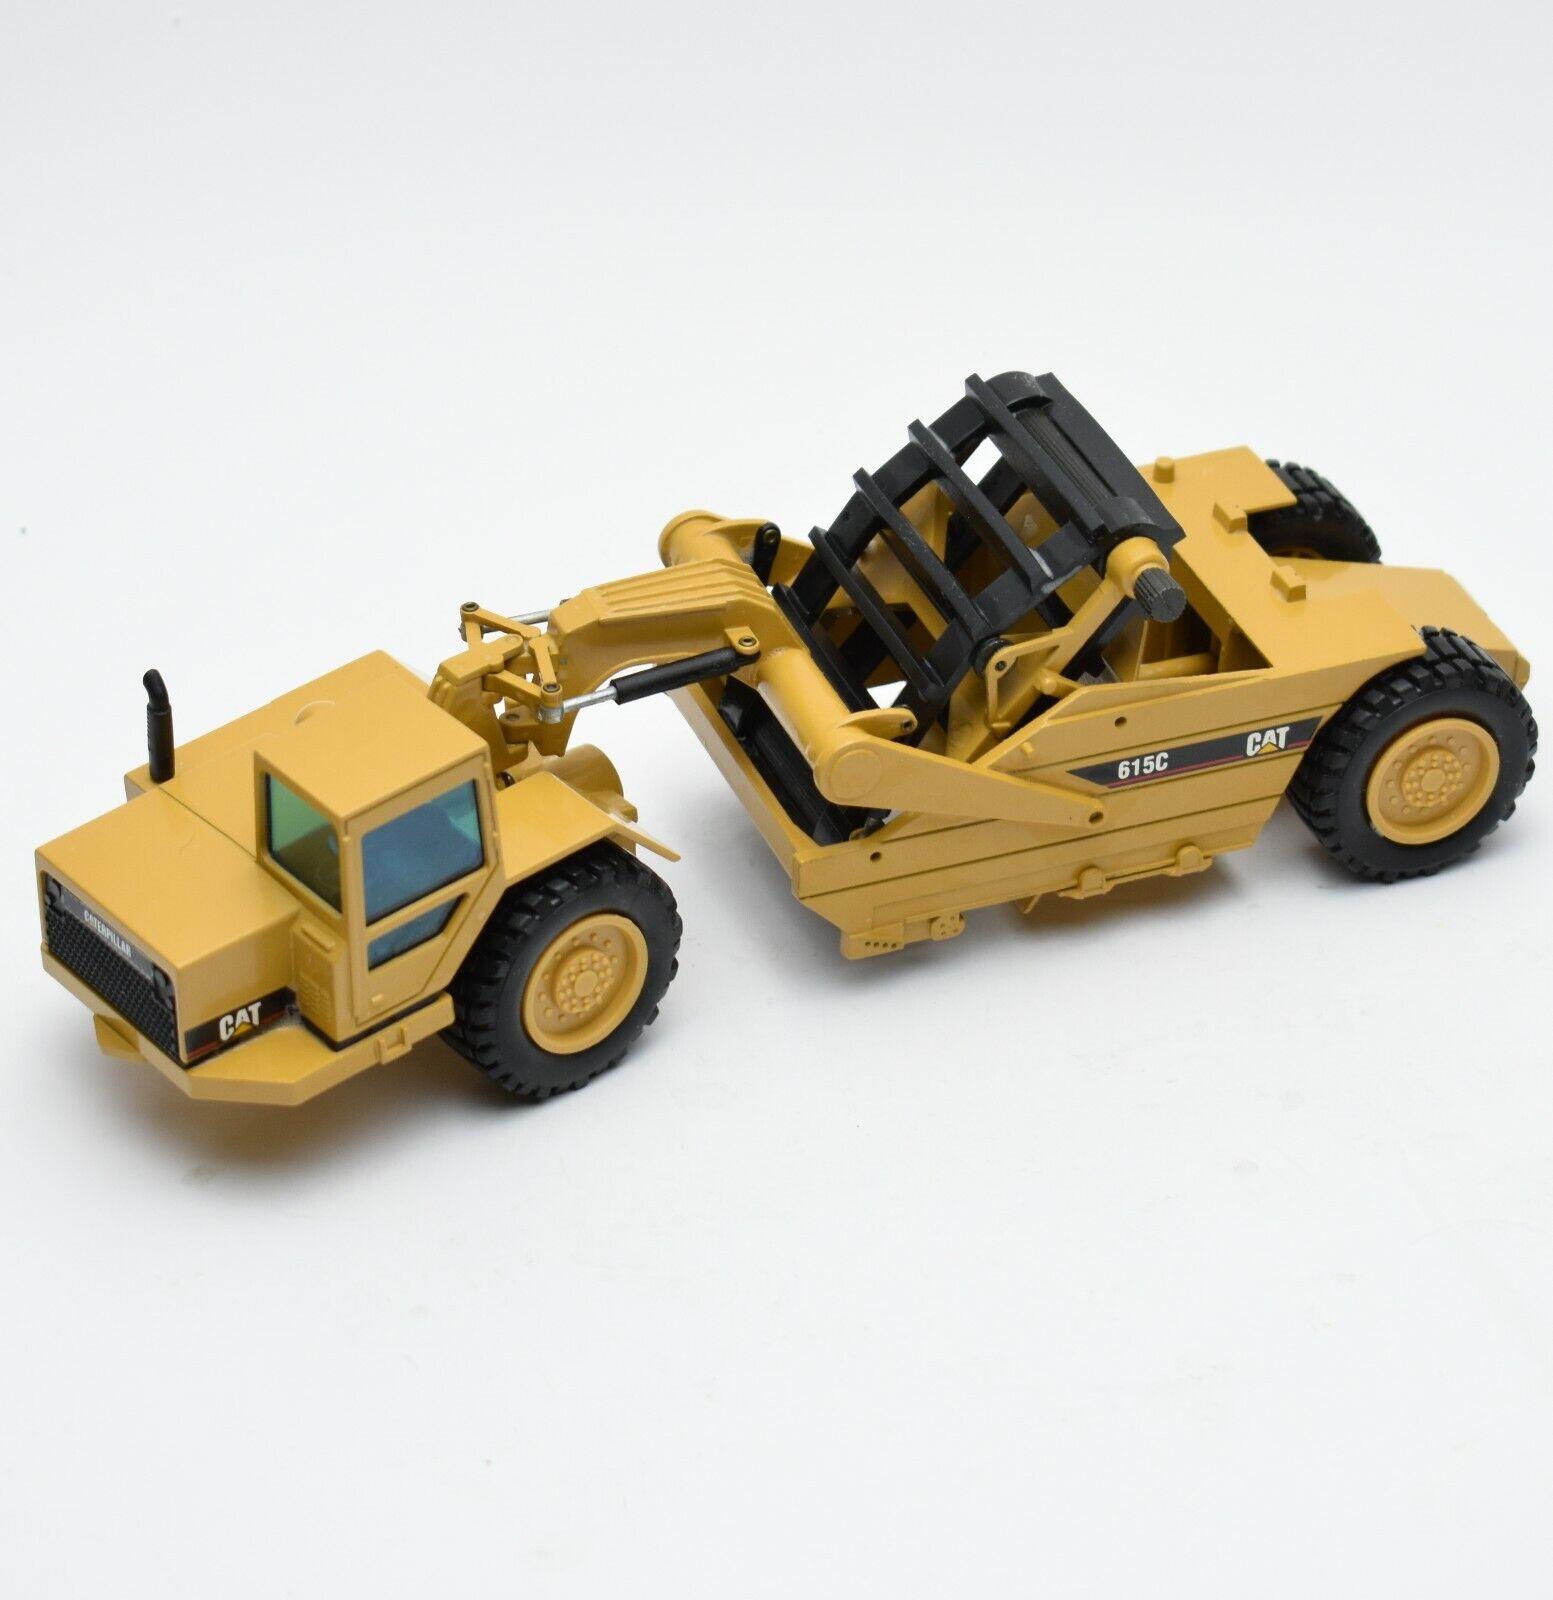 NZG 260 Cat 601 Selbstlade - Schürfzug  Caterpillar, OVP, 1 50, X020